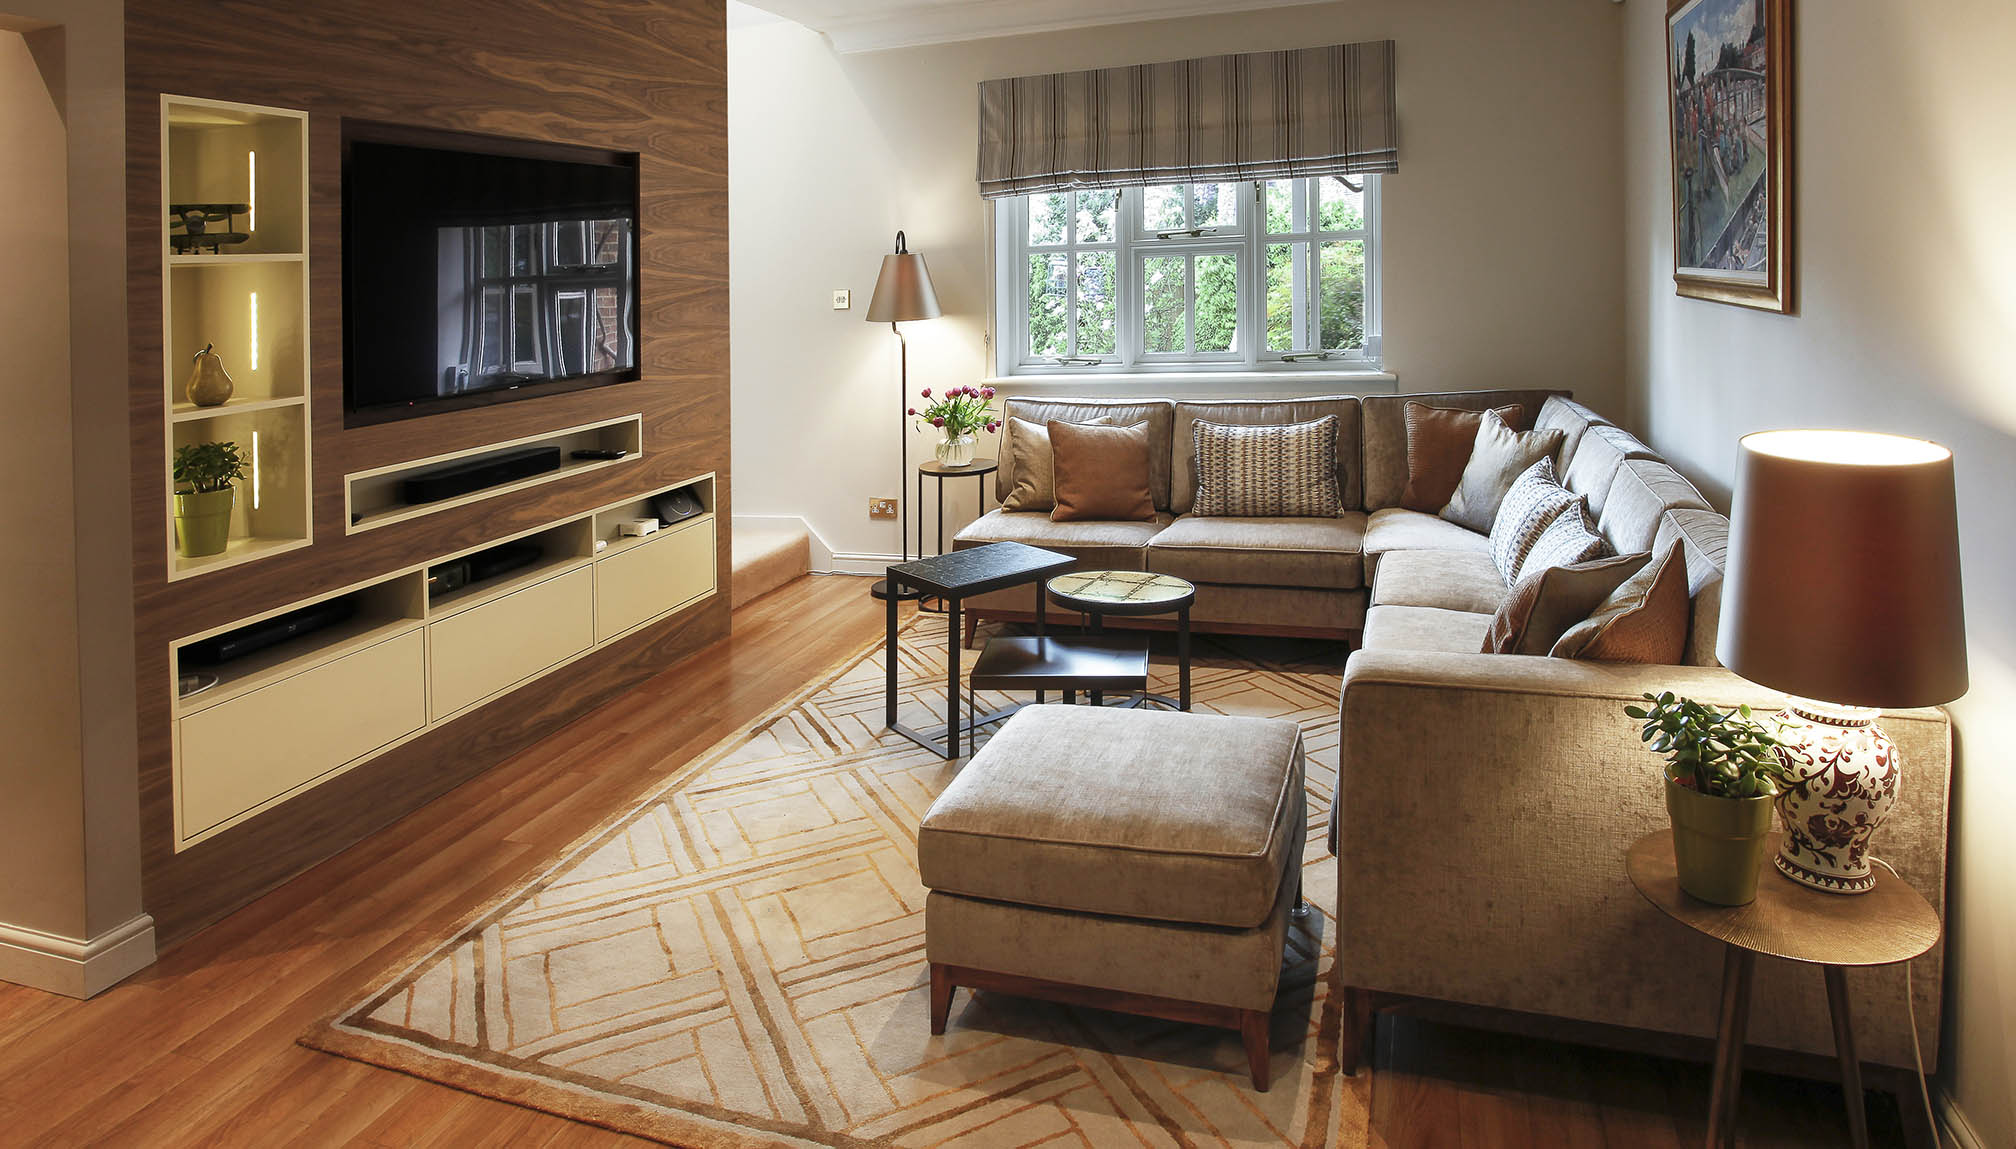 SandraRothwell Interior Design2.0